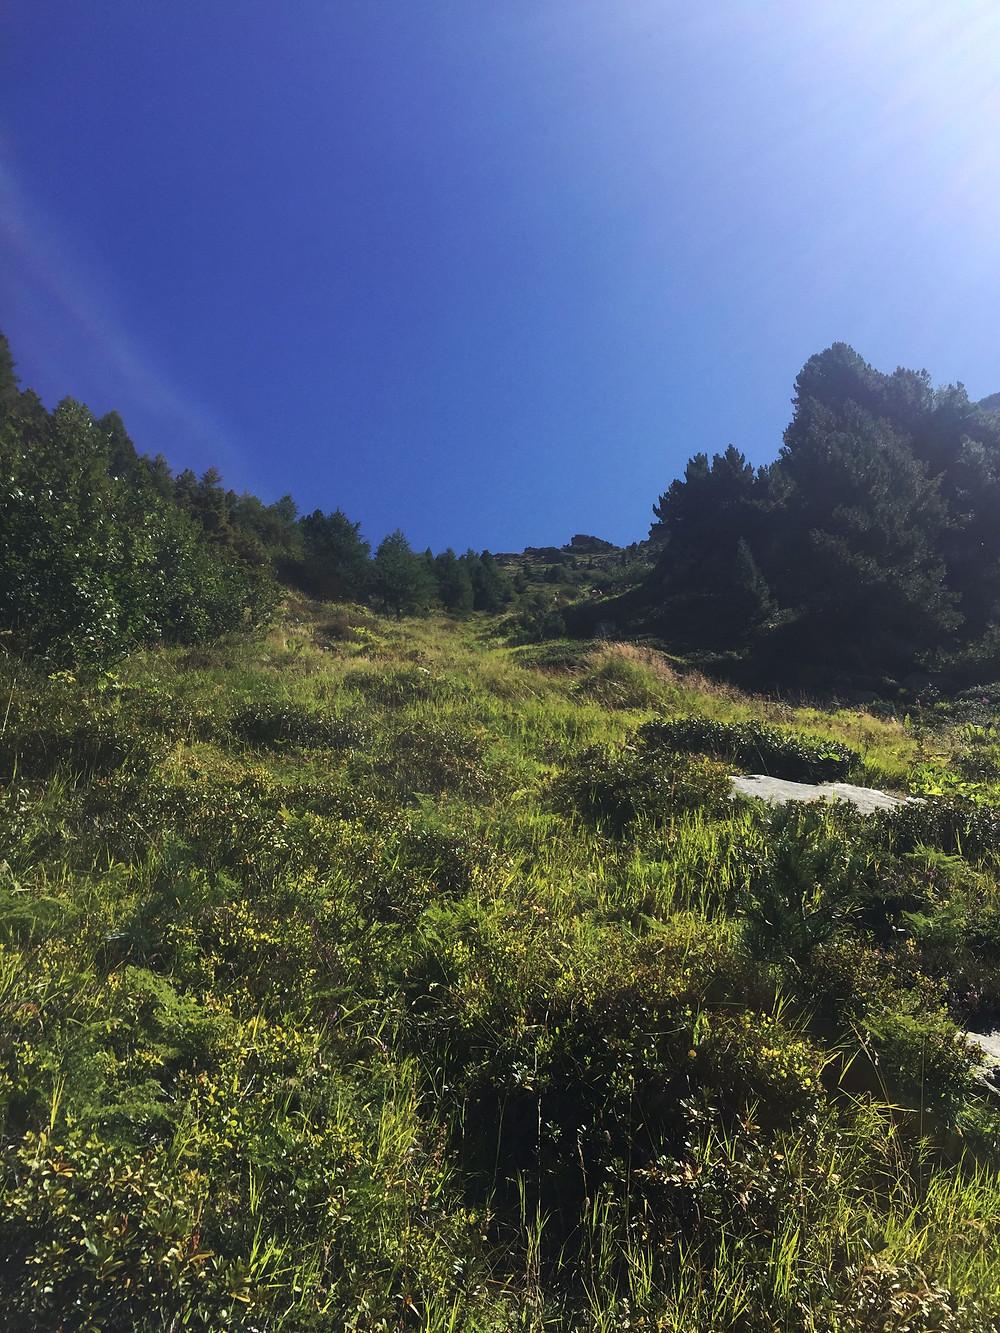 Steep, lush green hiking trail in Chamonix France